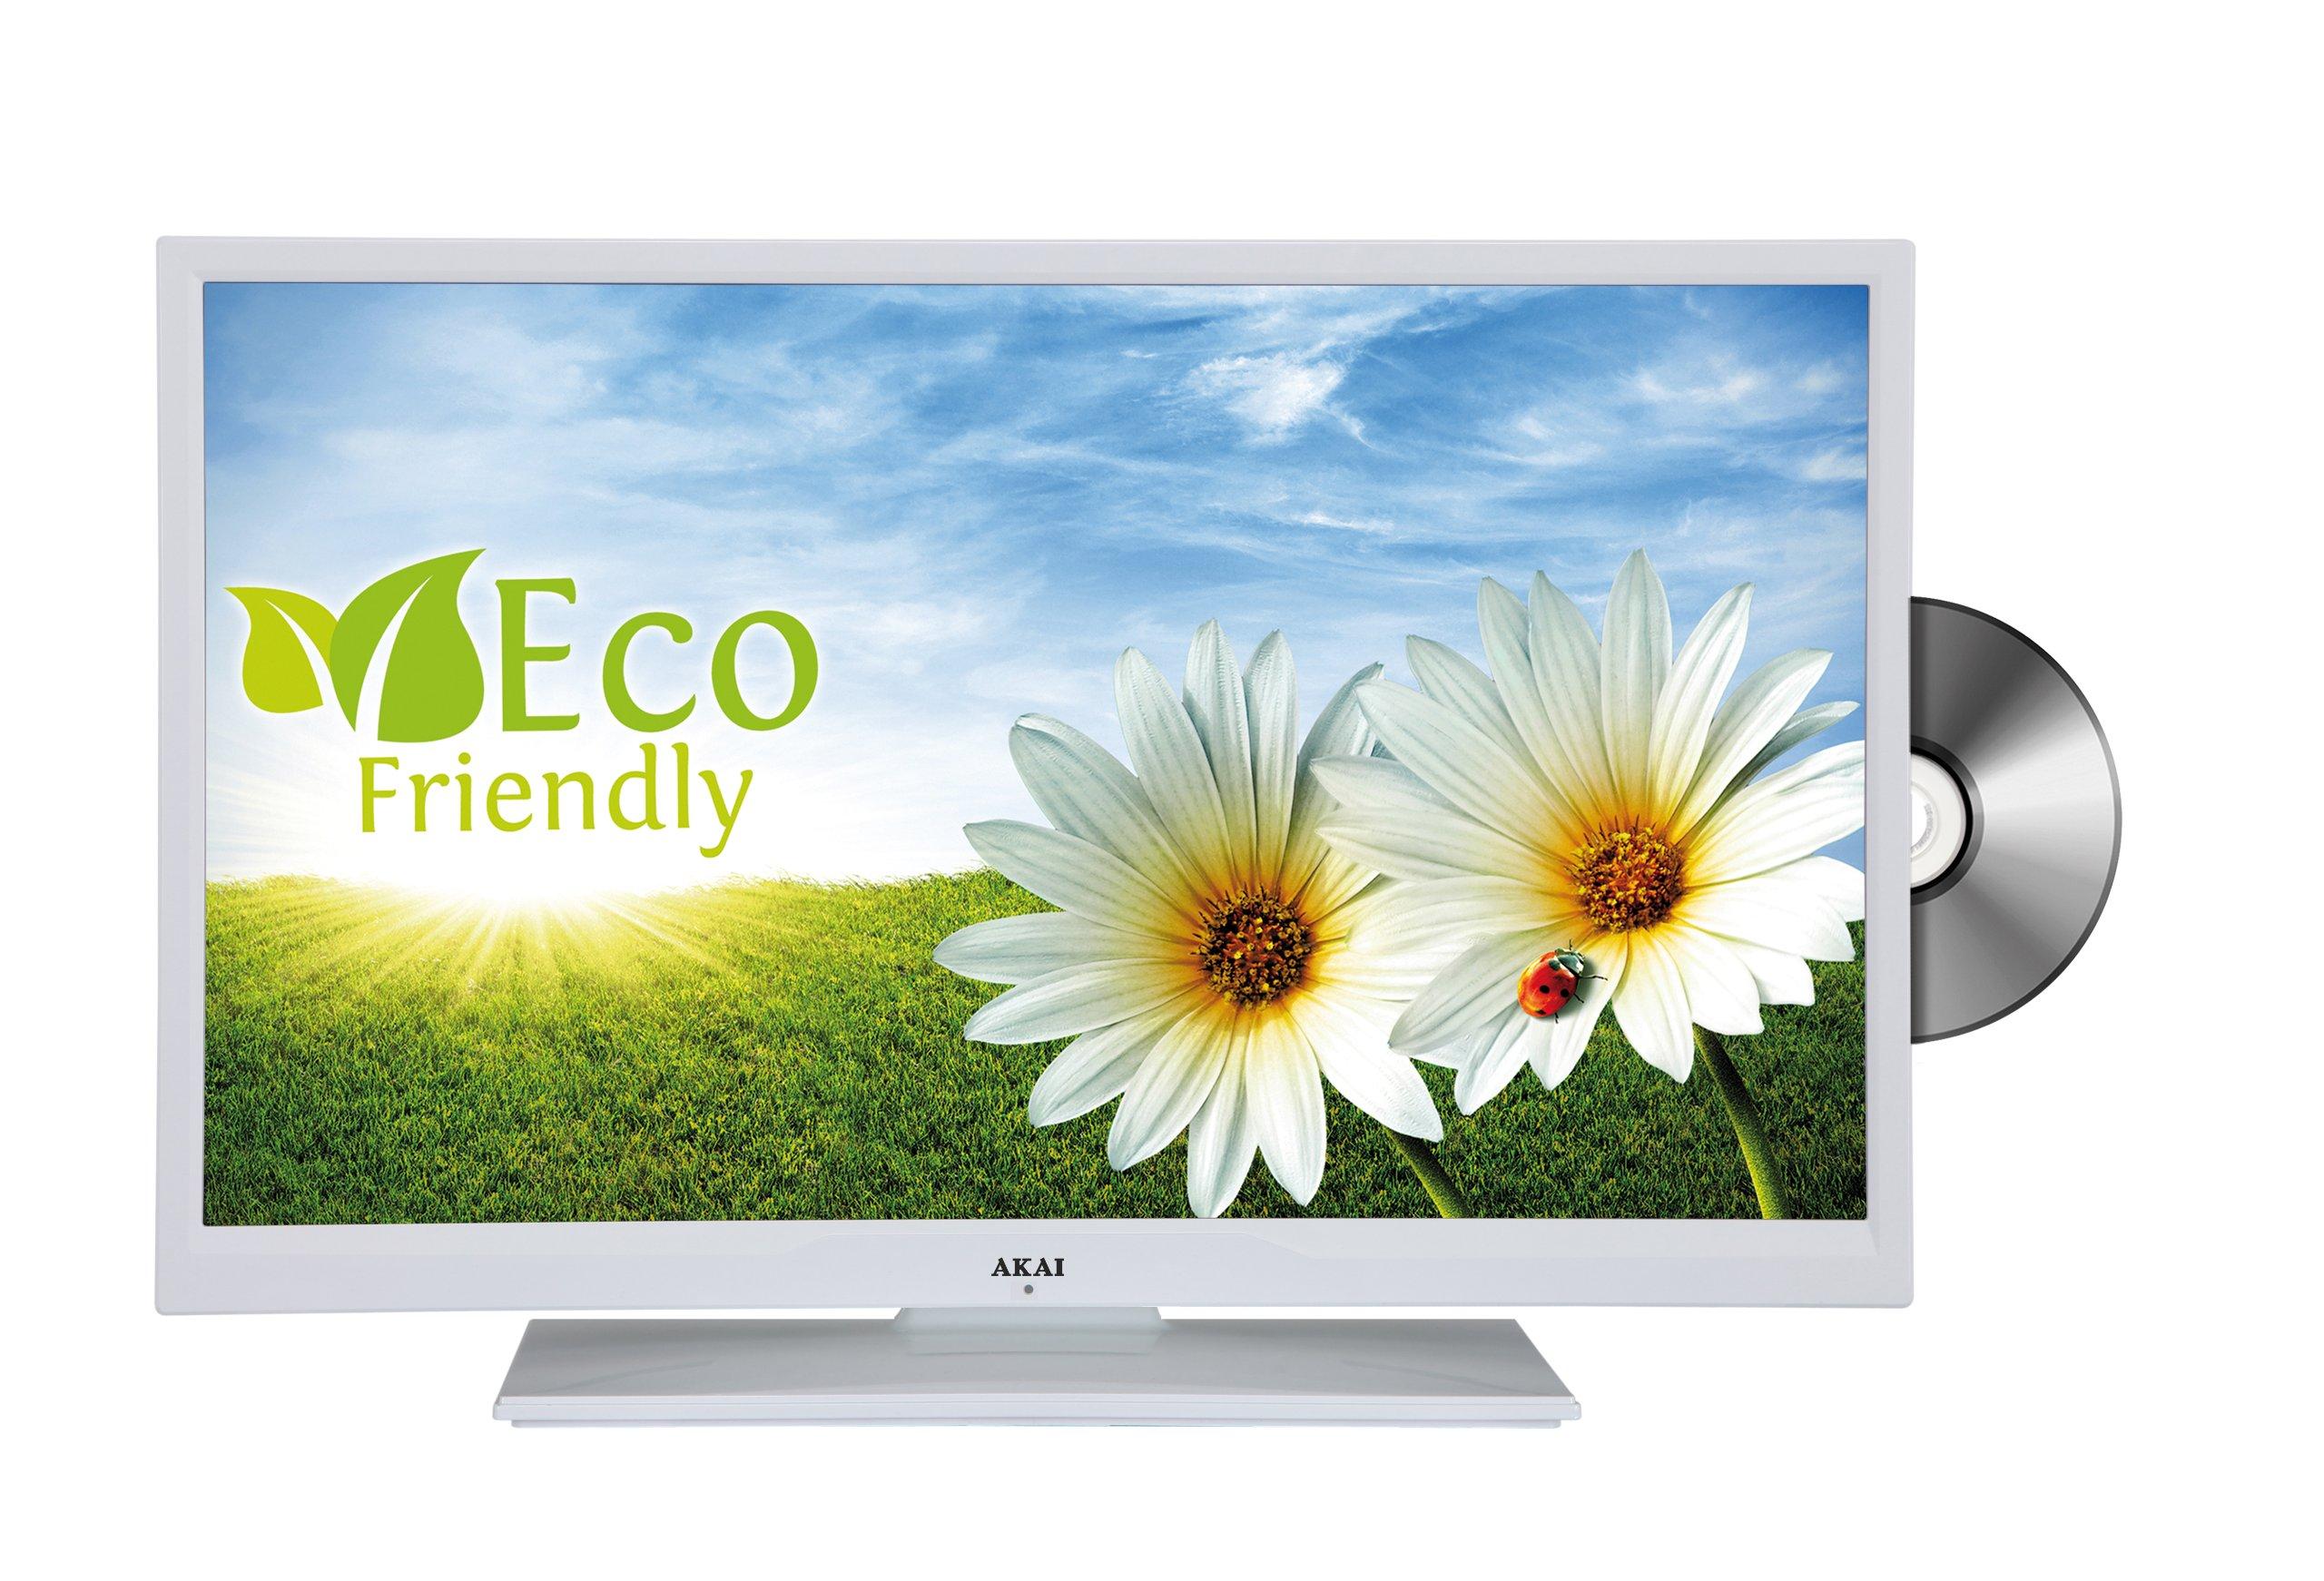 Akai aled26 09twe 66 cm (26 pulgadas) – Televisor con retroiluminación LED (HD Ready, DVB-T/-C, DVD, USB 2.0), color blanco mate: Amazon.es: Electrónica